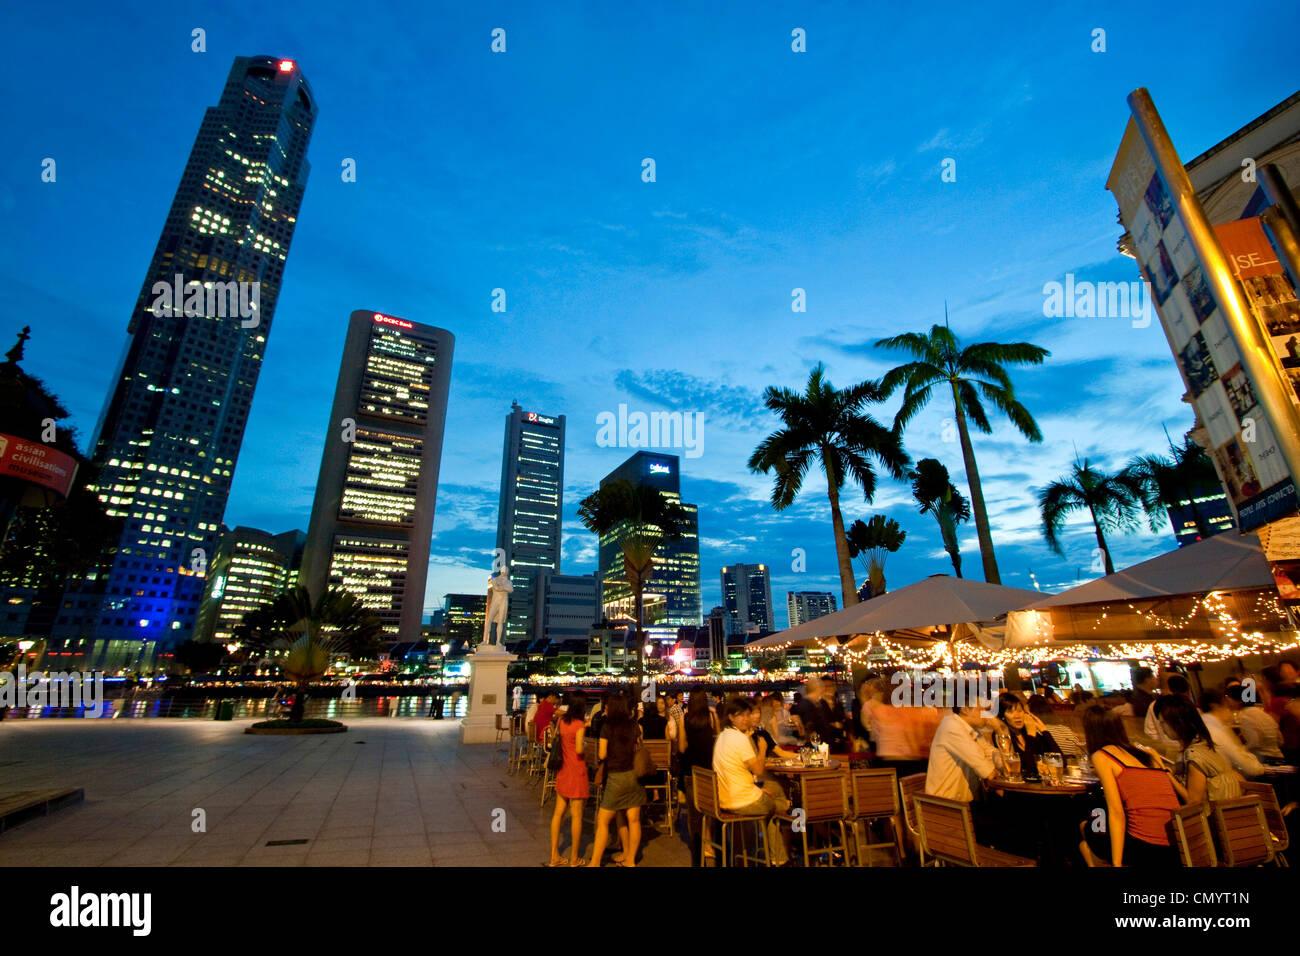 Skyline of Singapur, Raffles Statue, street cafe, South East Asia, twilightStock Photo